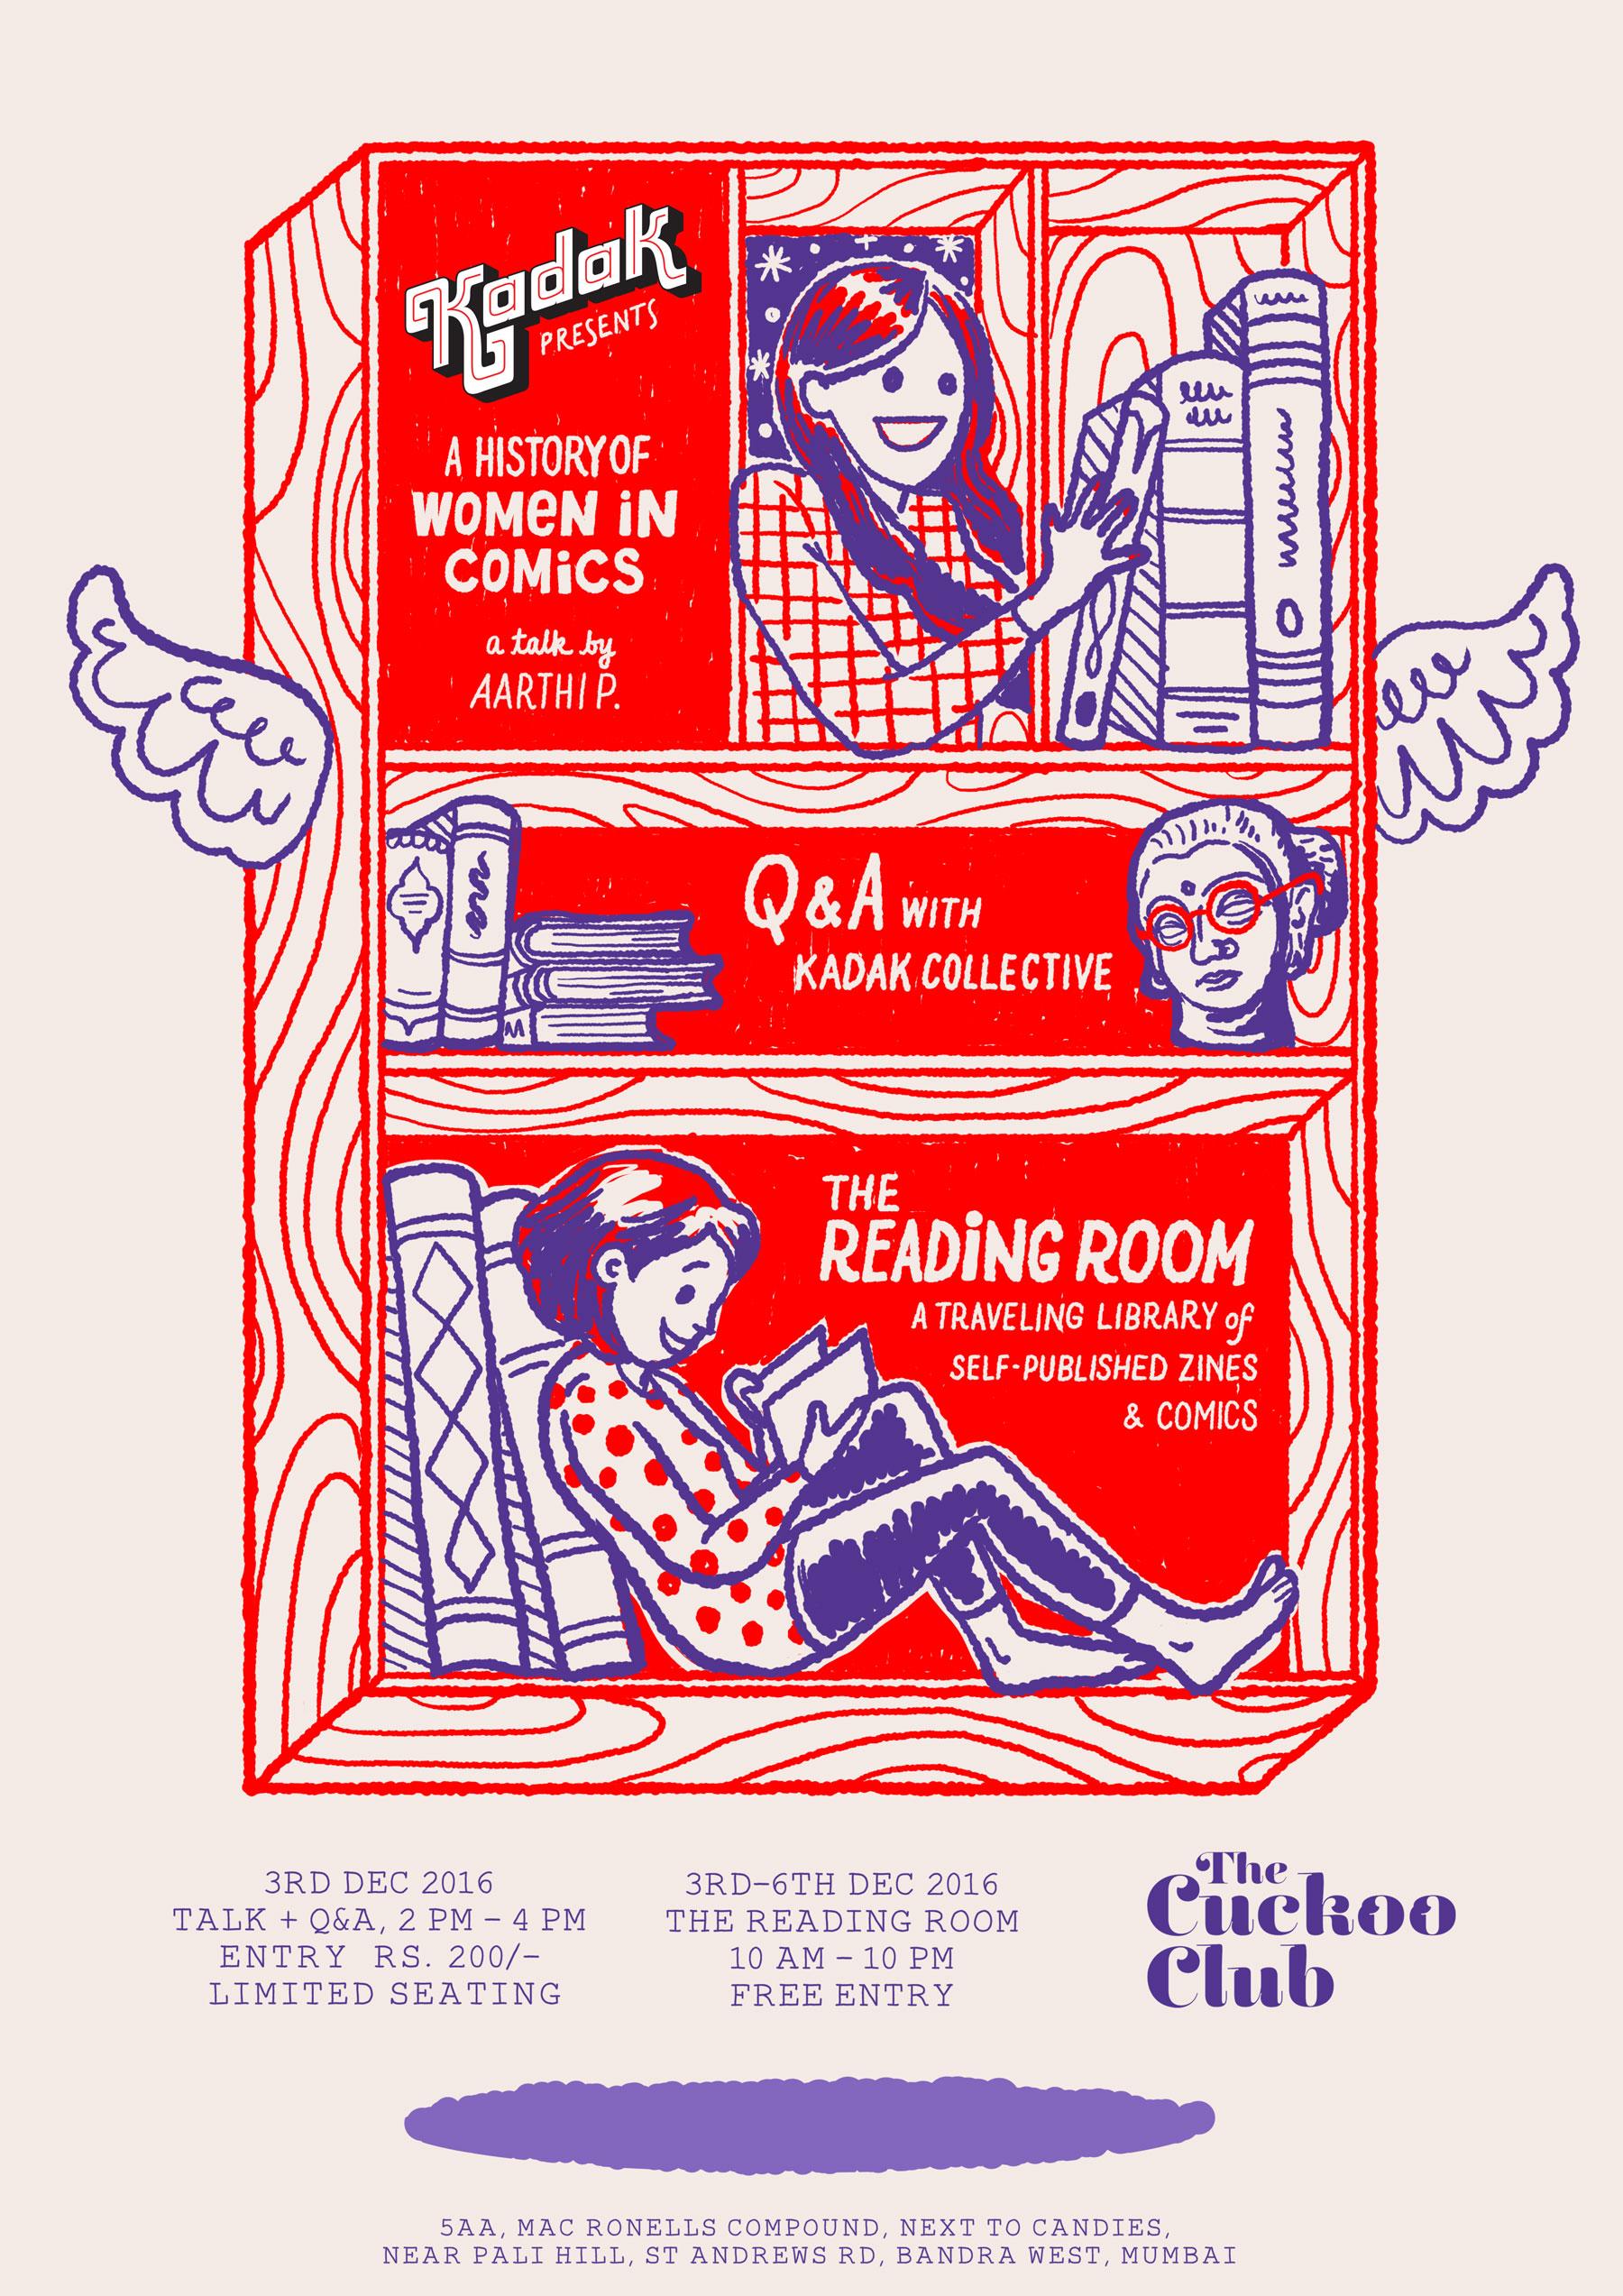 Cuckoo-Club-Poster.jpg